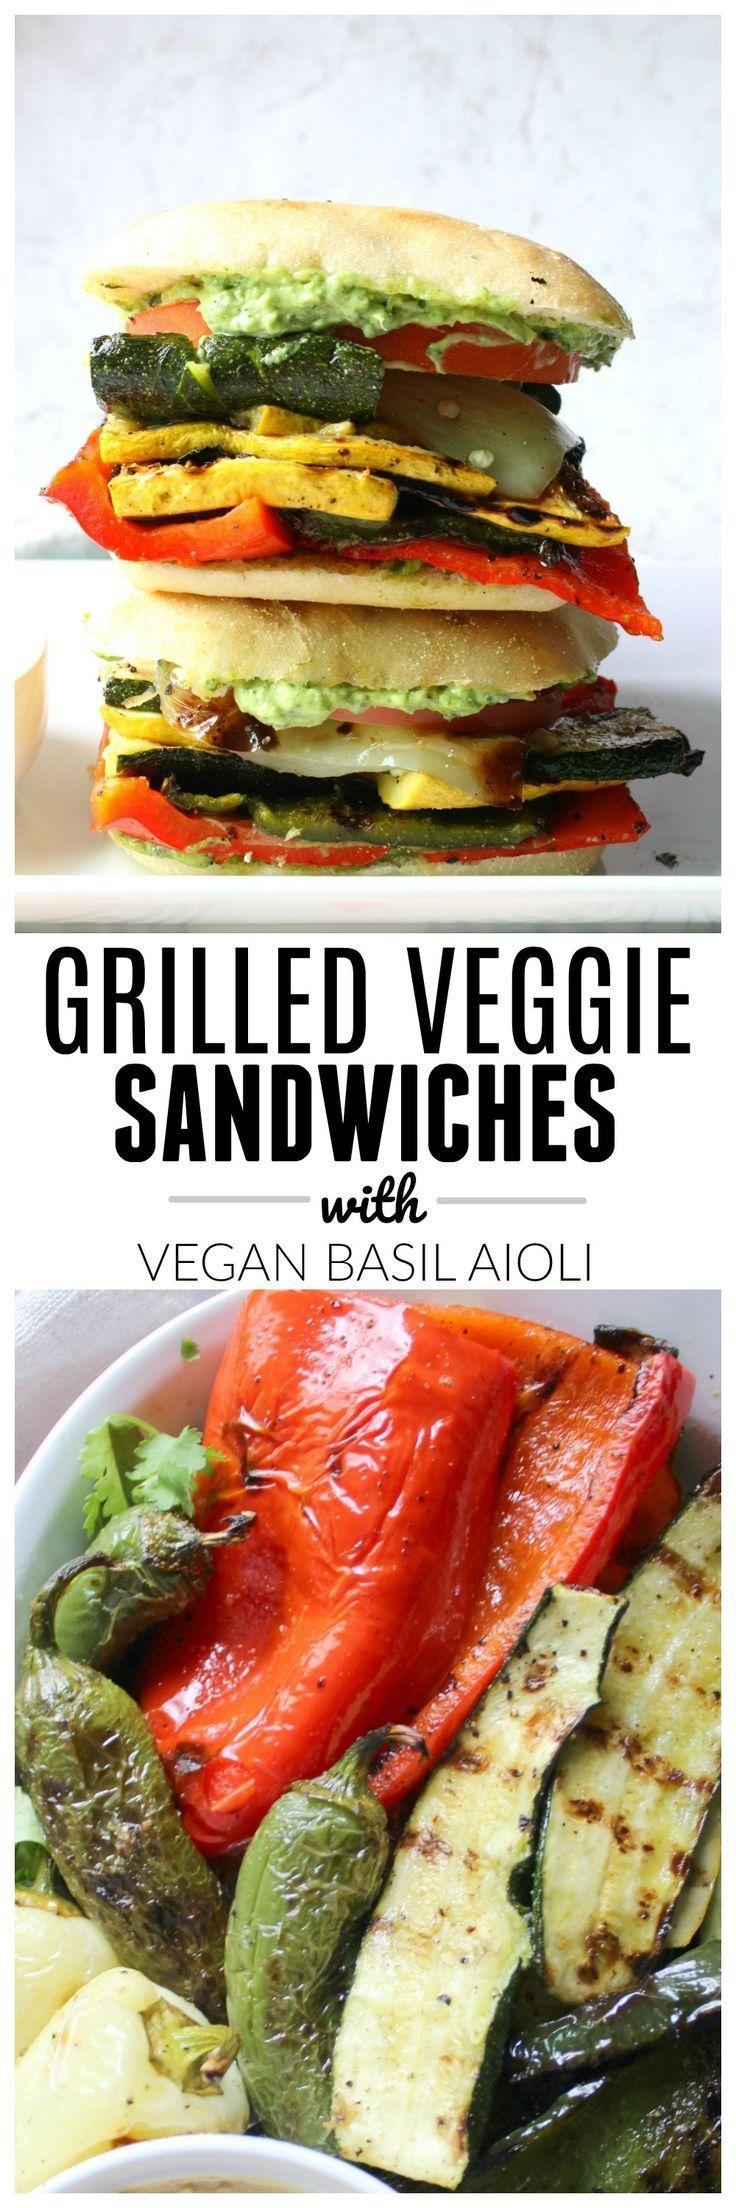 Grilled Veggie Sandwich with Vegan Basil Aioli